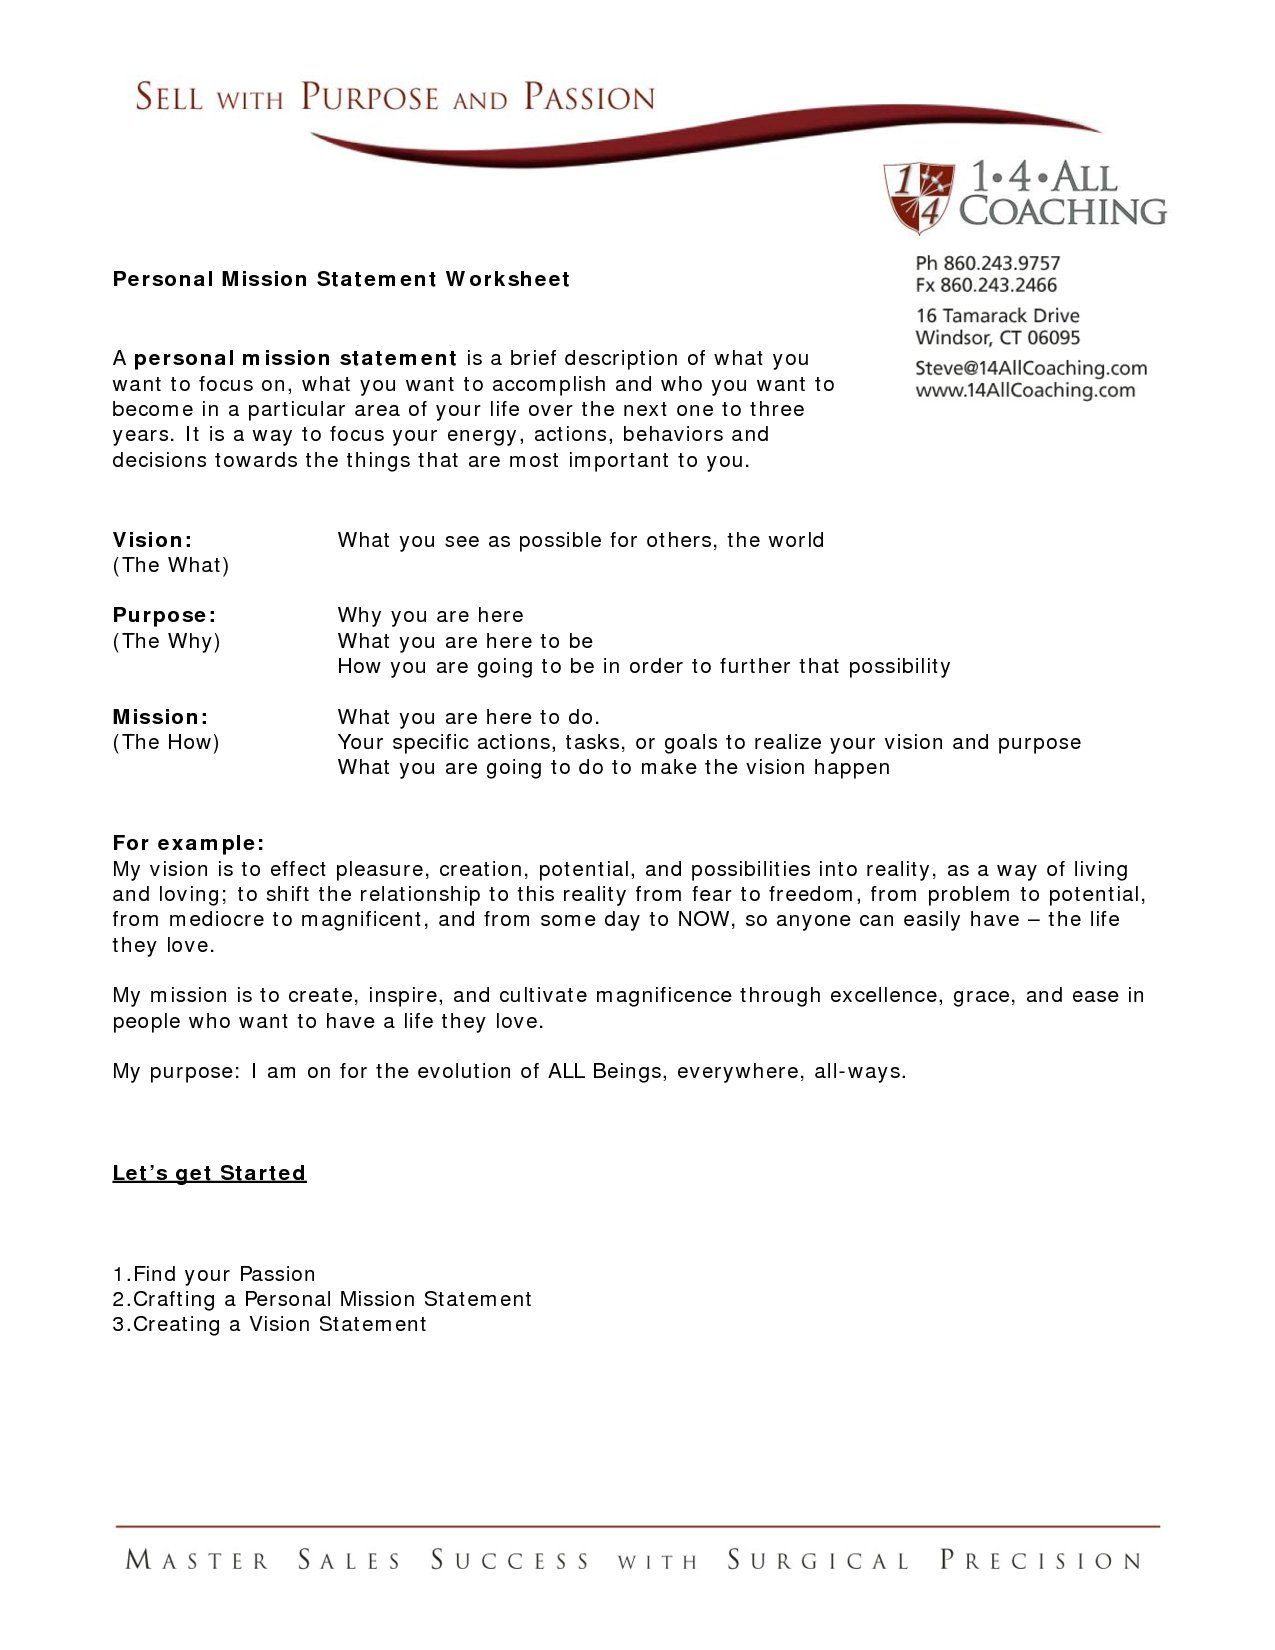 Lirikpas Your Essay Pinterest